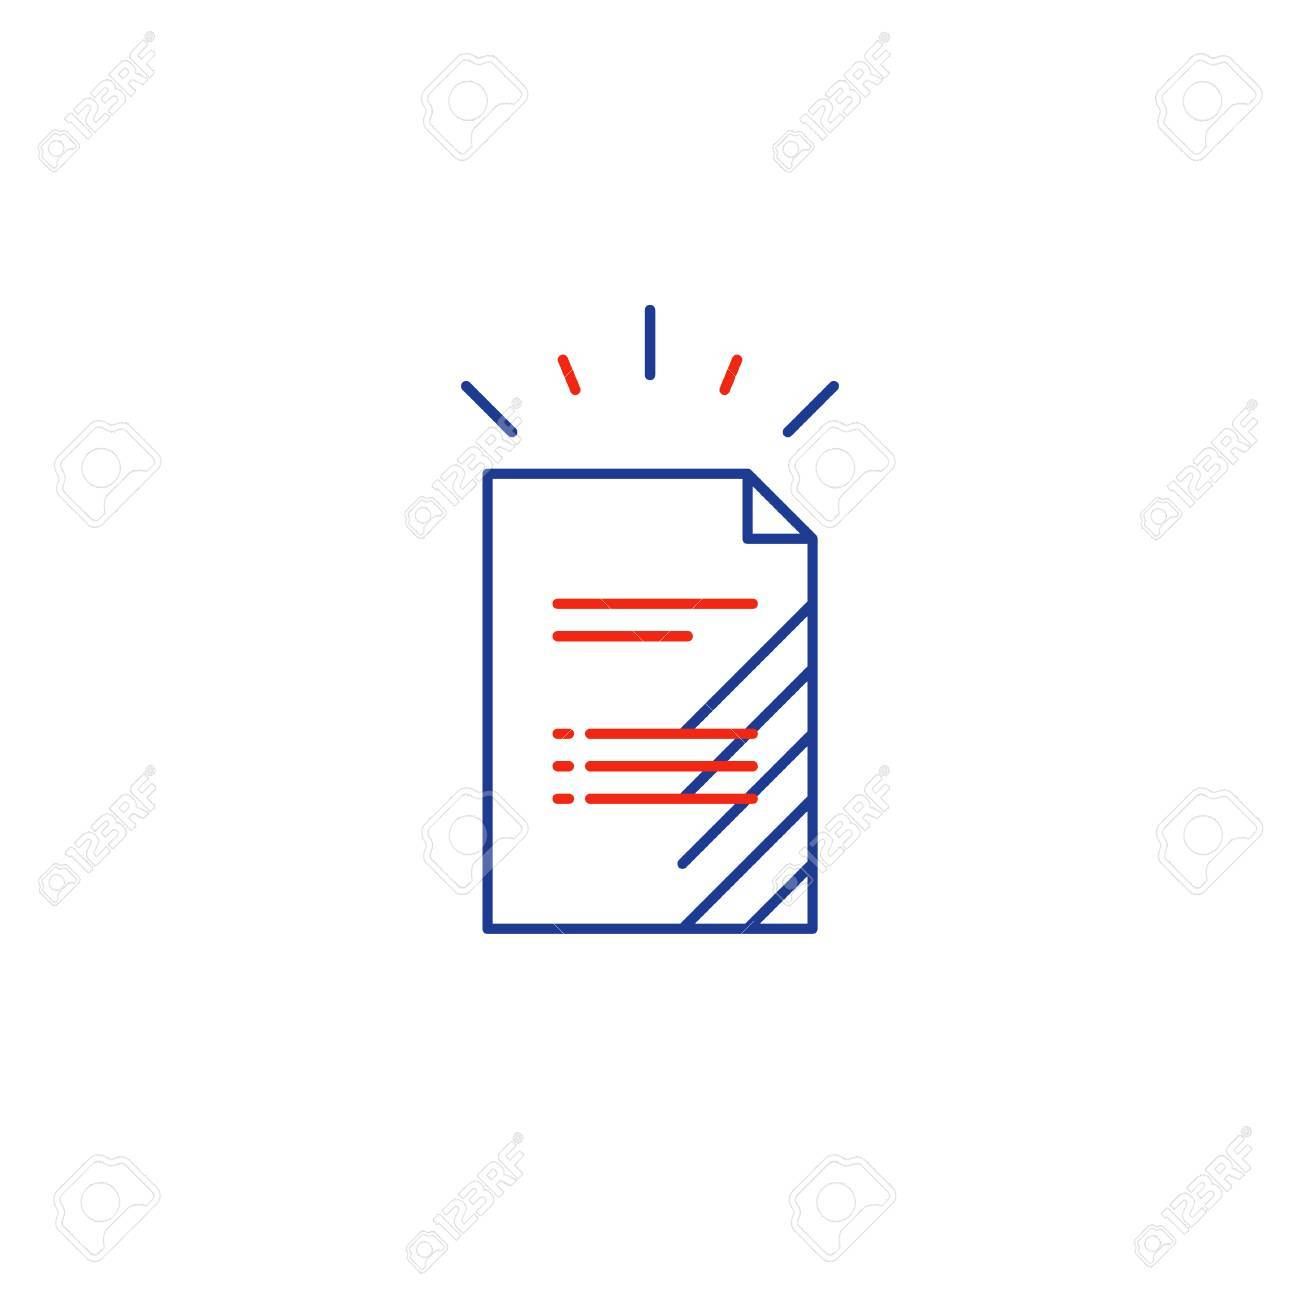 Document Sheet Resume Concept Application Form Business